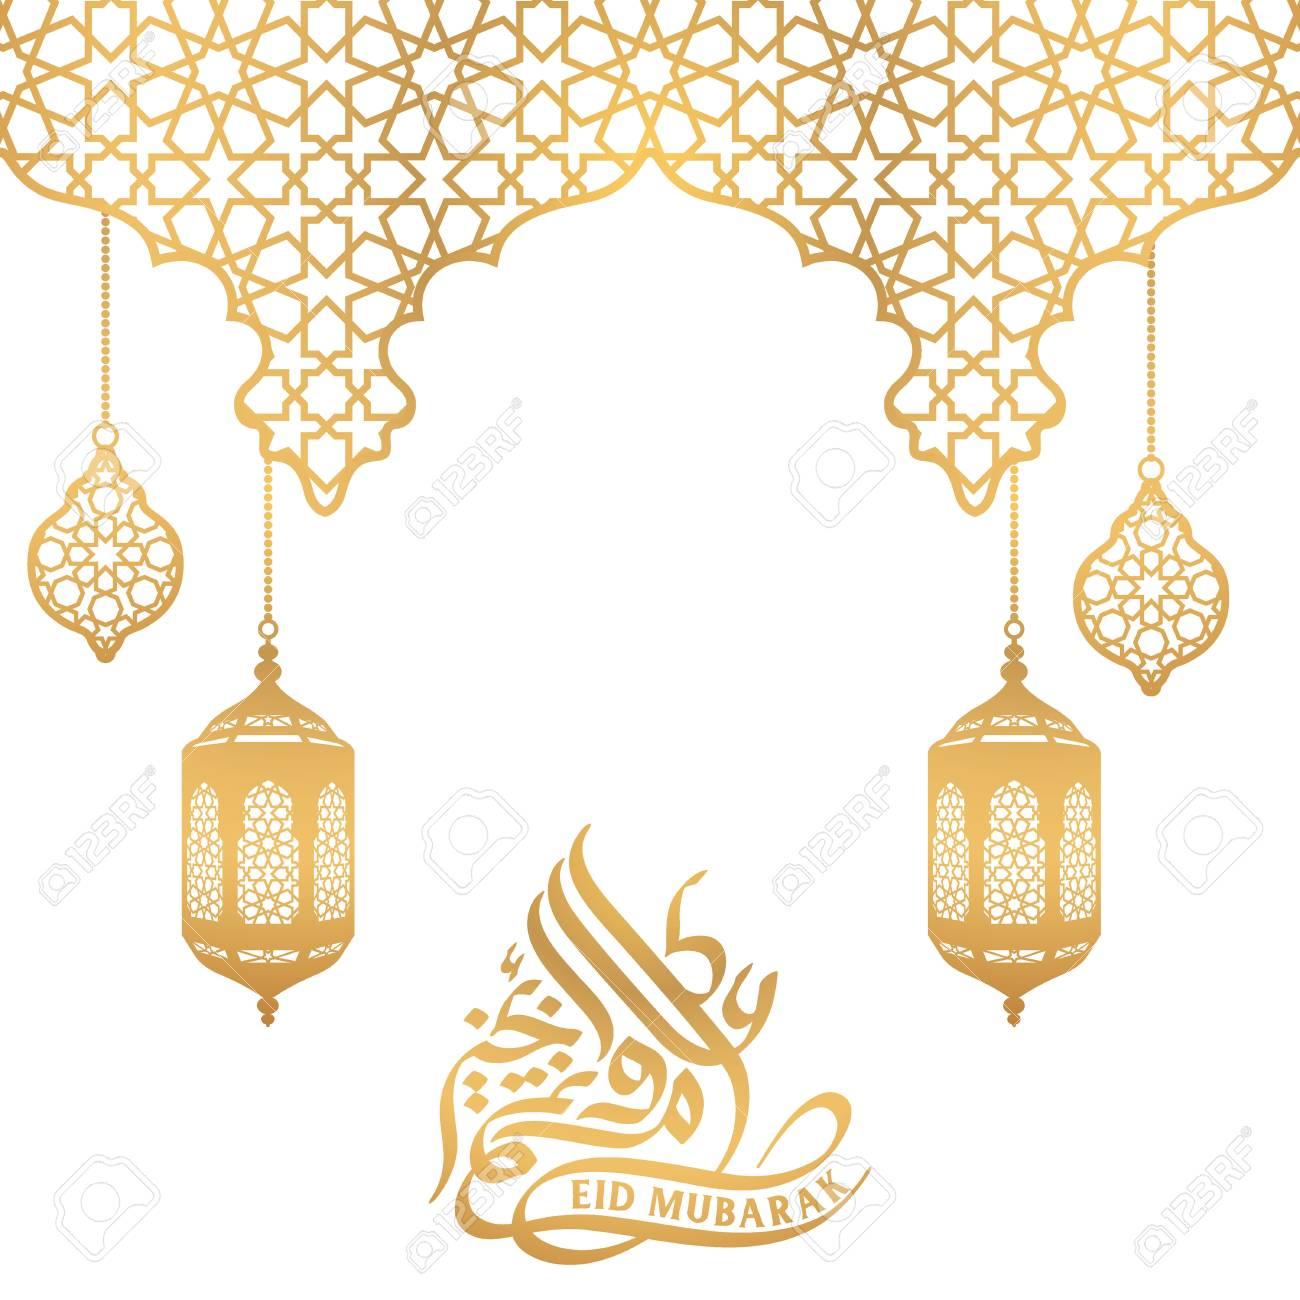 eid lantern template  Eid Mubarak greeting card template with morocco pattern and lantern